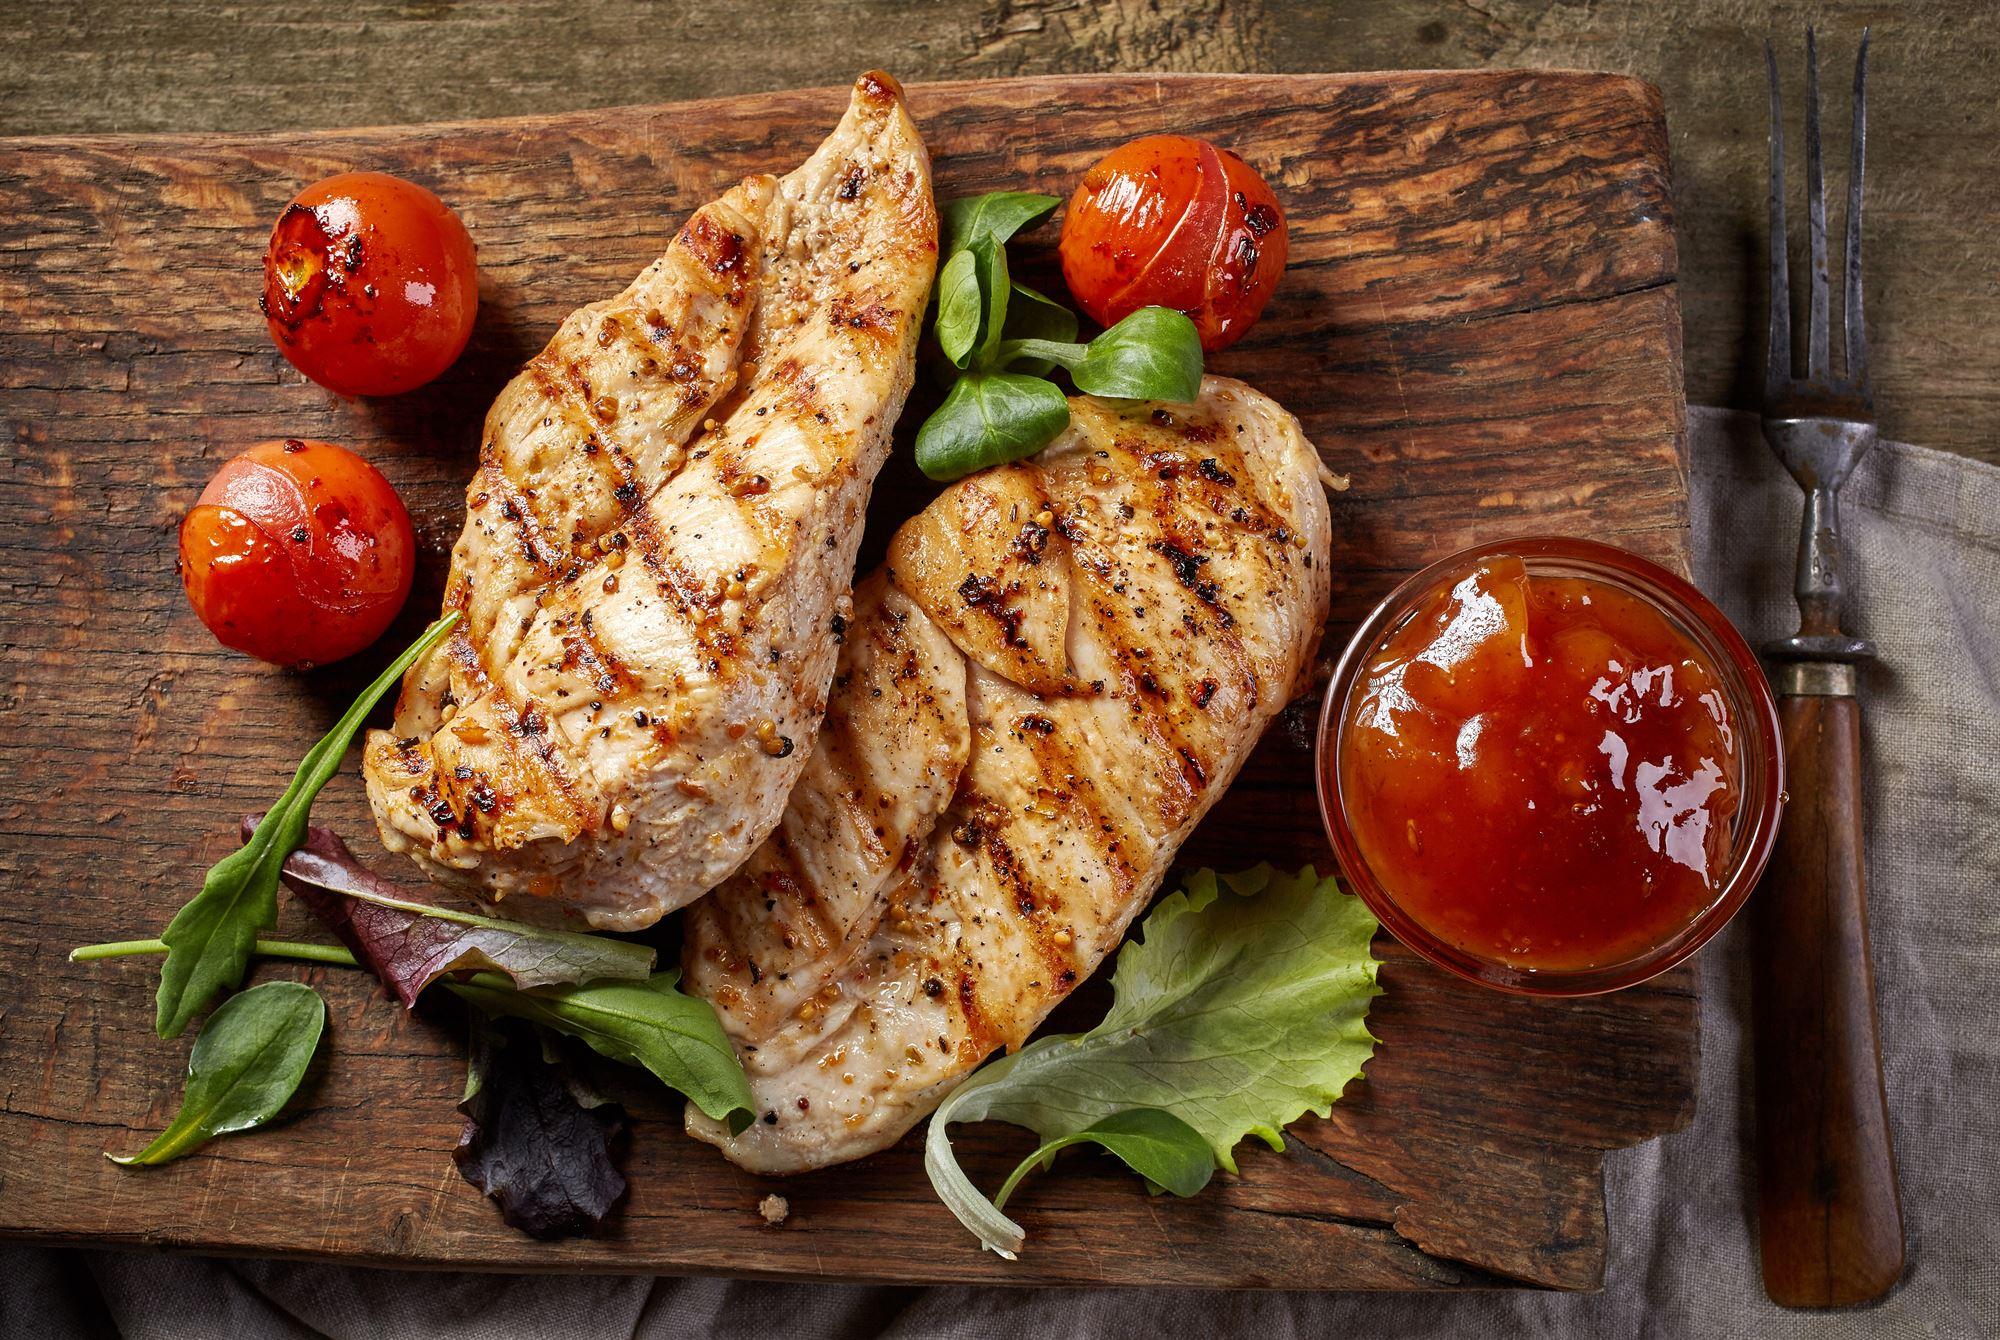 Grillet kyllingebryst med gazpachosalsa